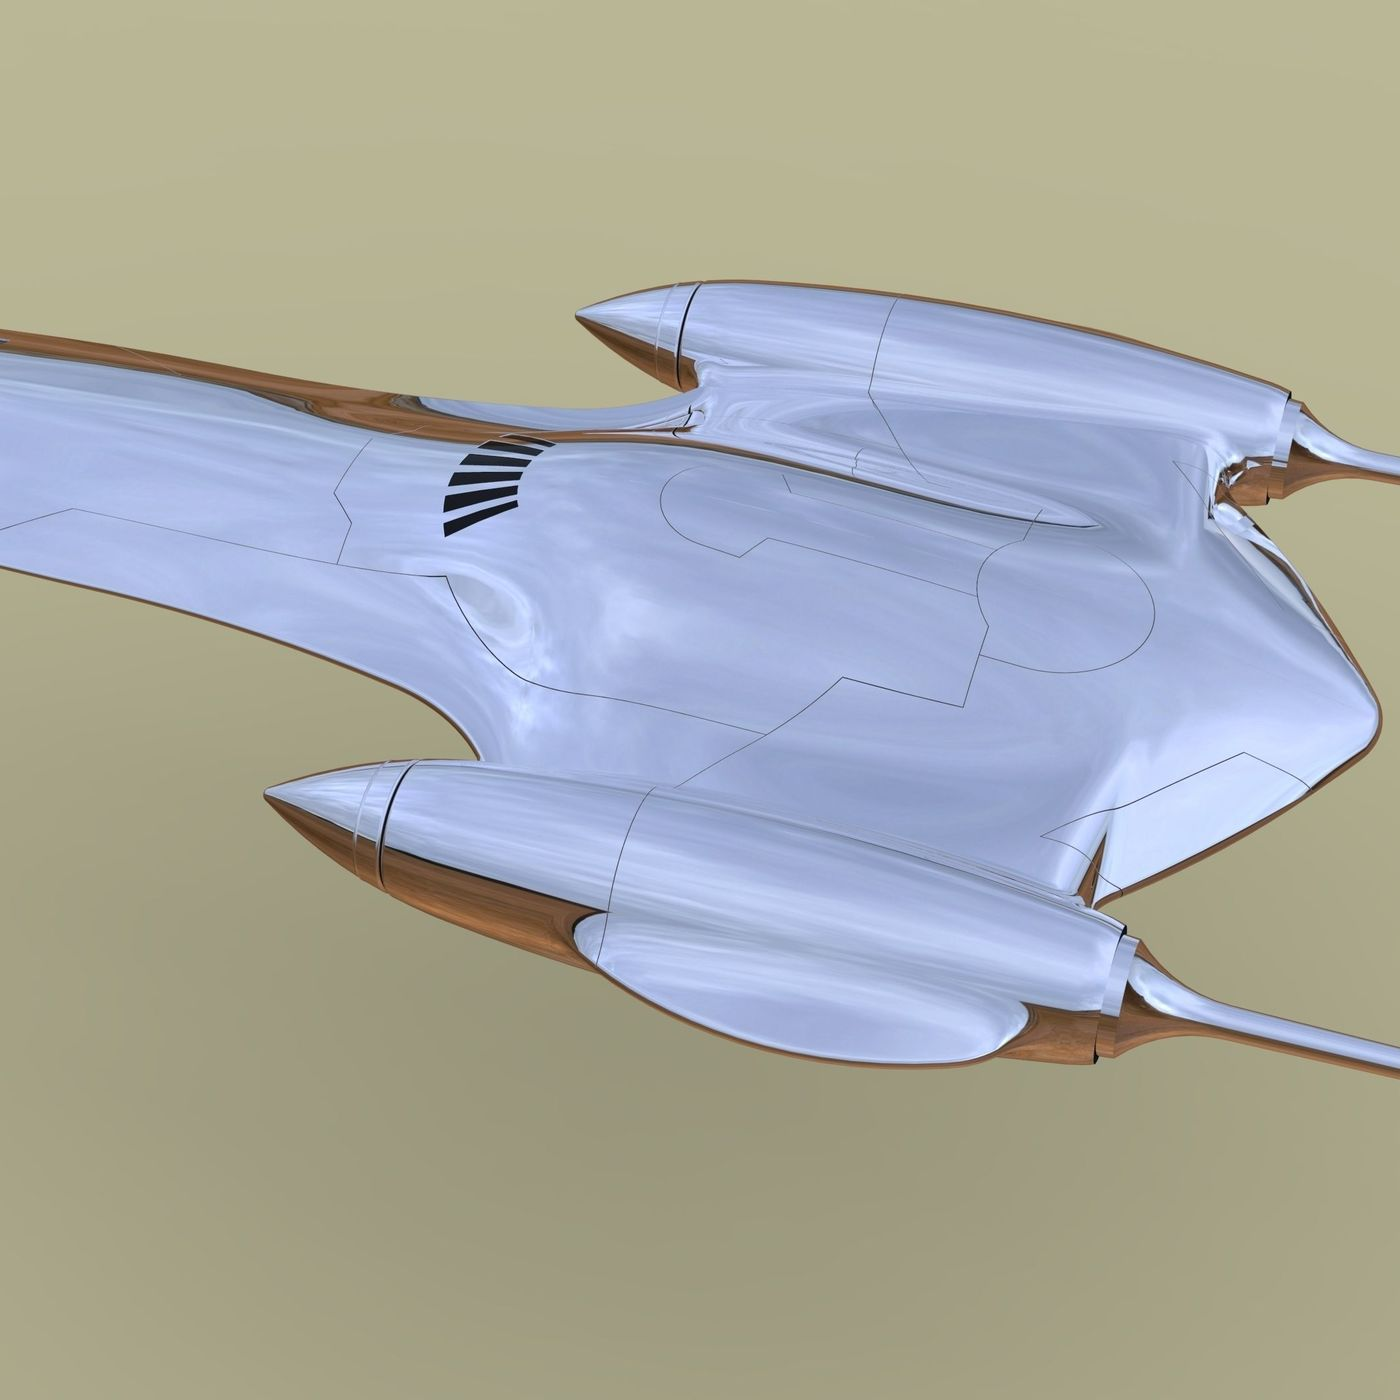 Naboo Queens Royal starship